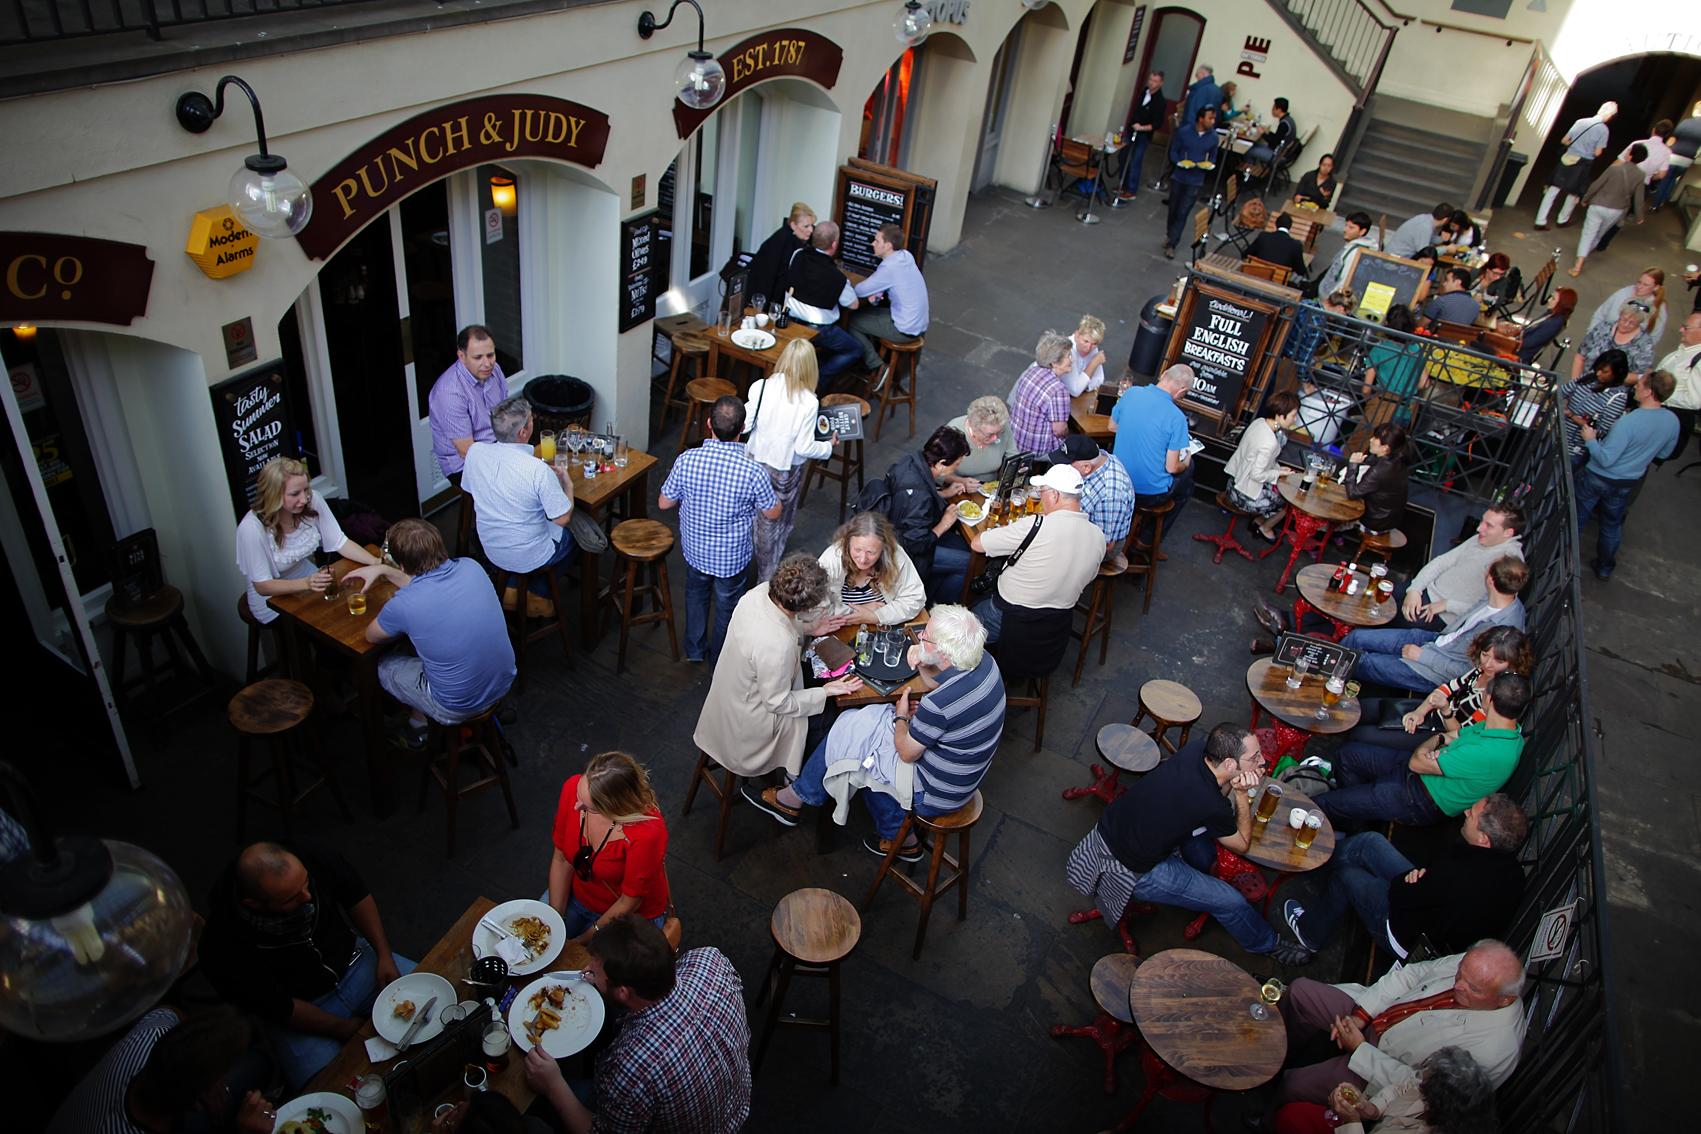 Pubs in London